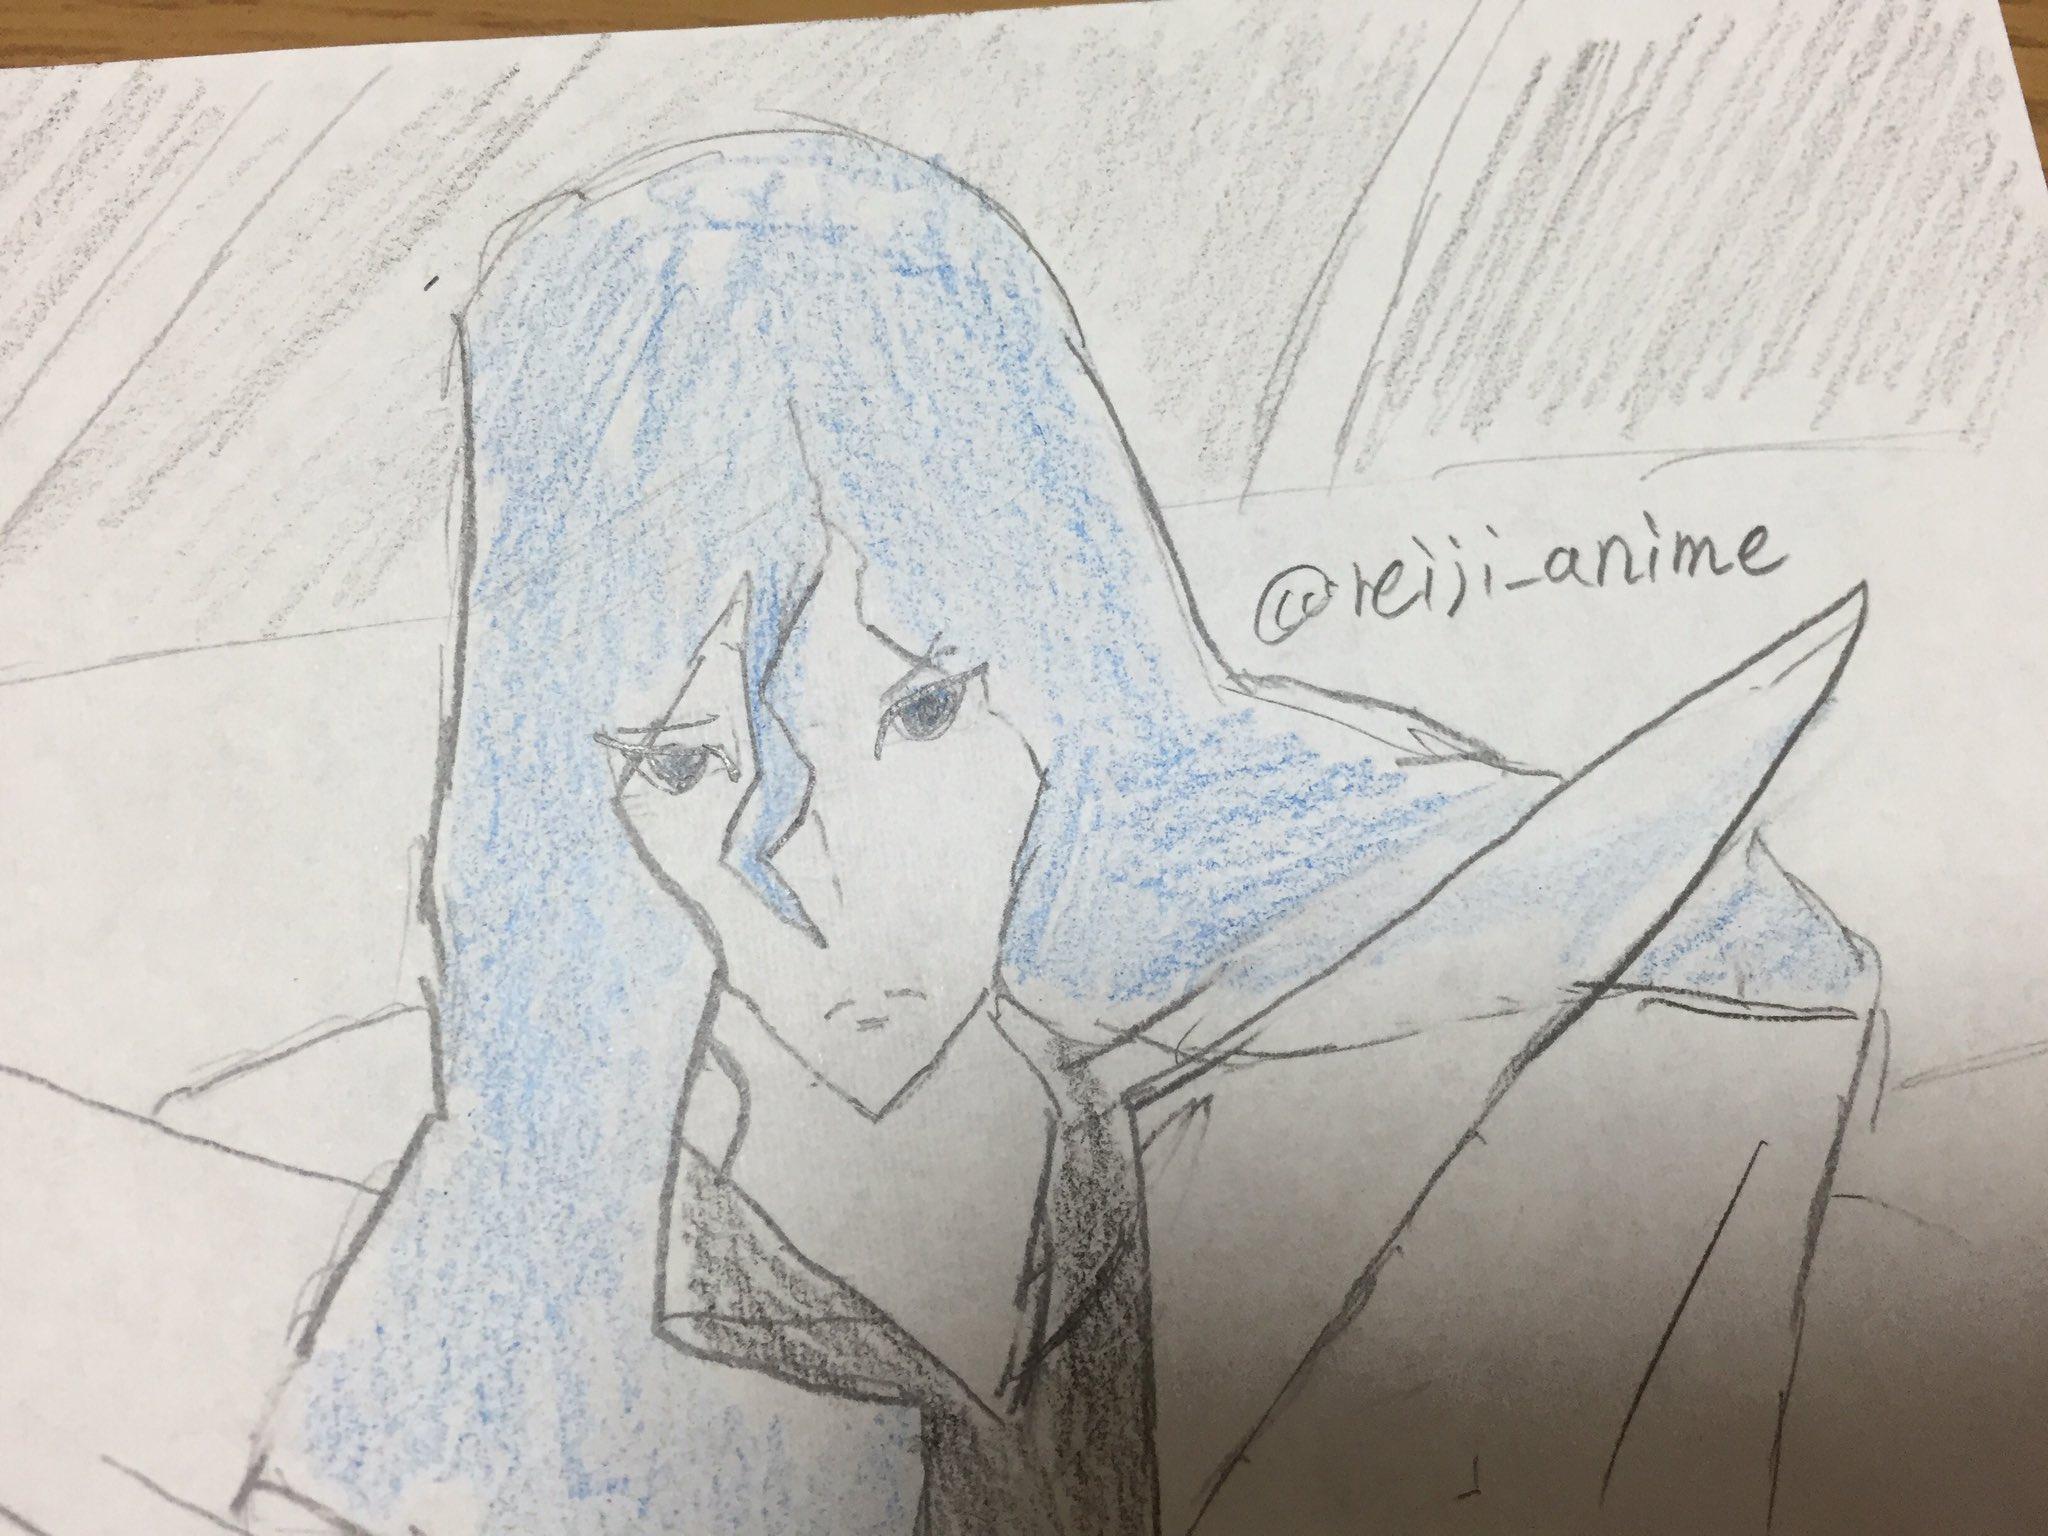 Rei@はいふり視聴完了 (@reiji_anime)さんのイラスト